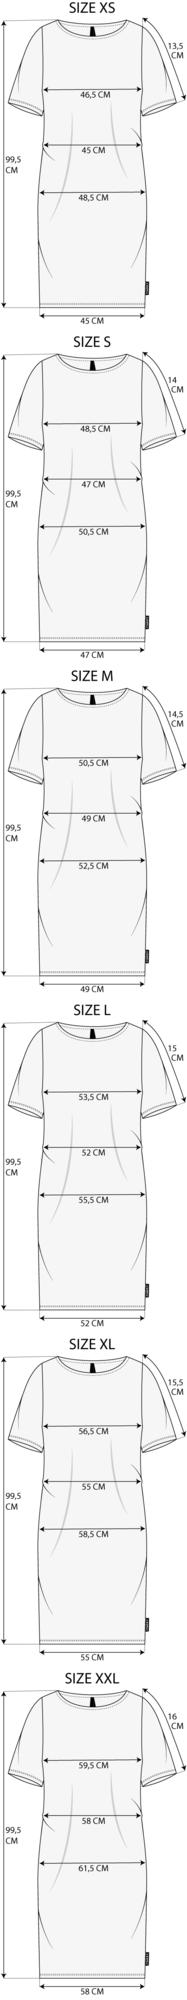 Maattabel Robe